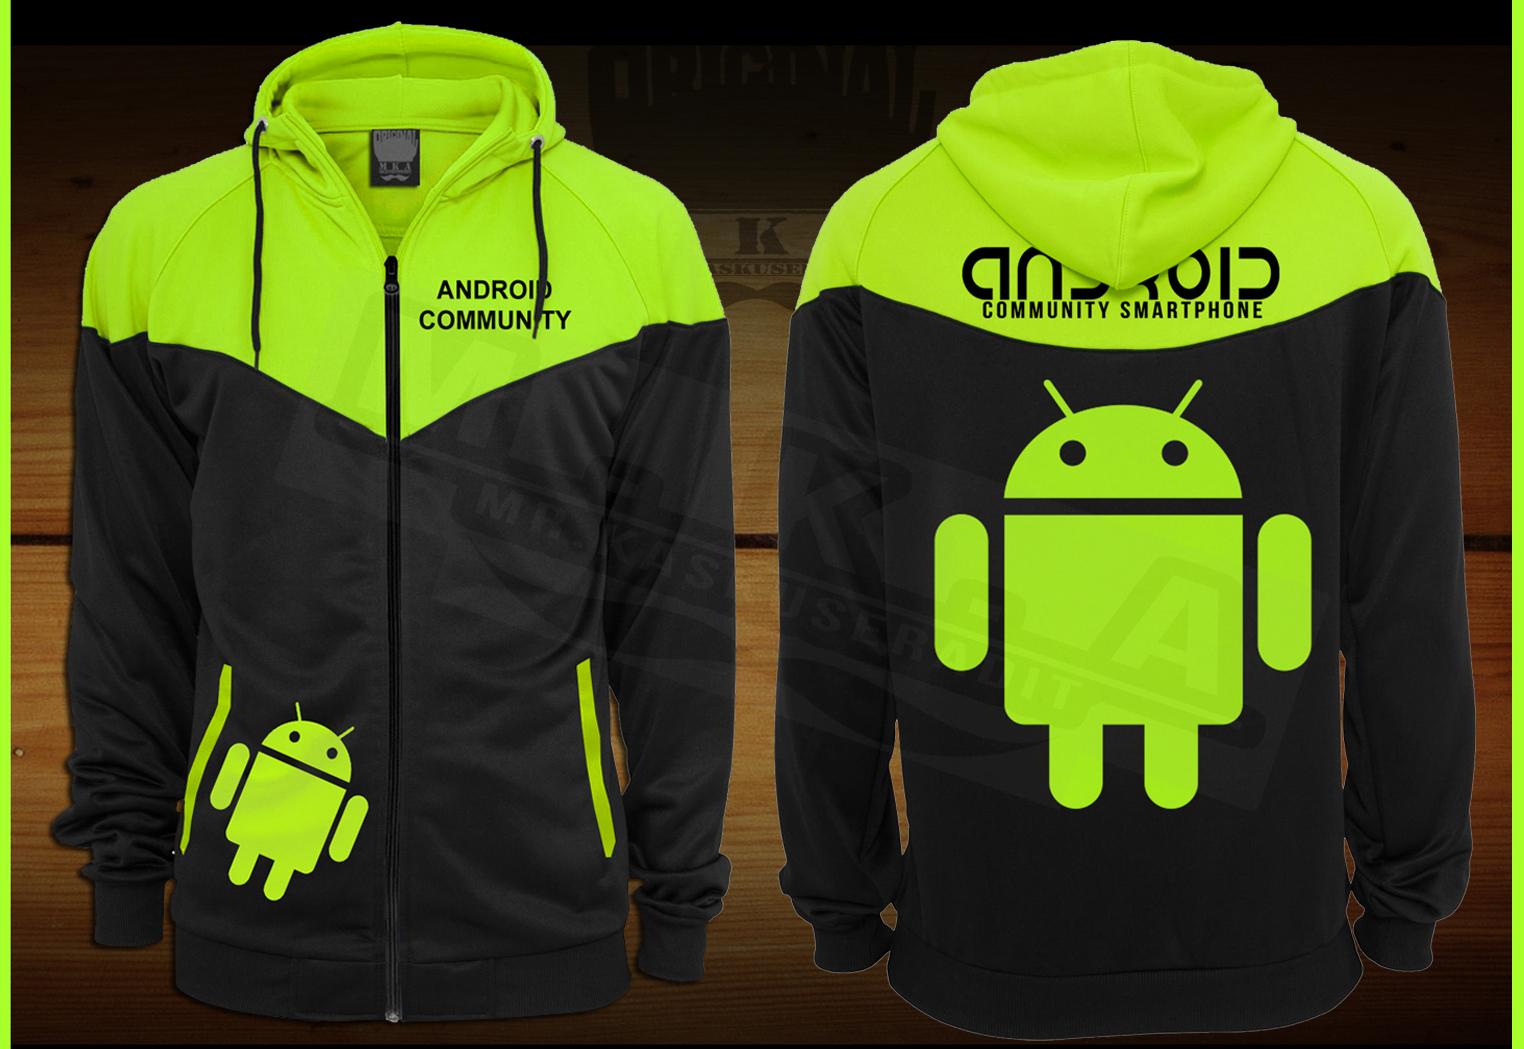 jaket android, kaos android, android tshirt, baju android